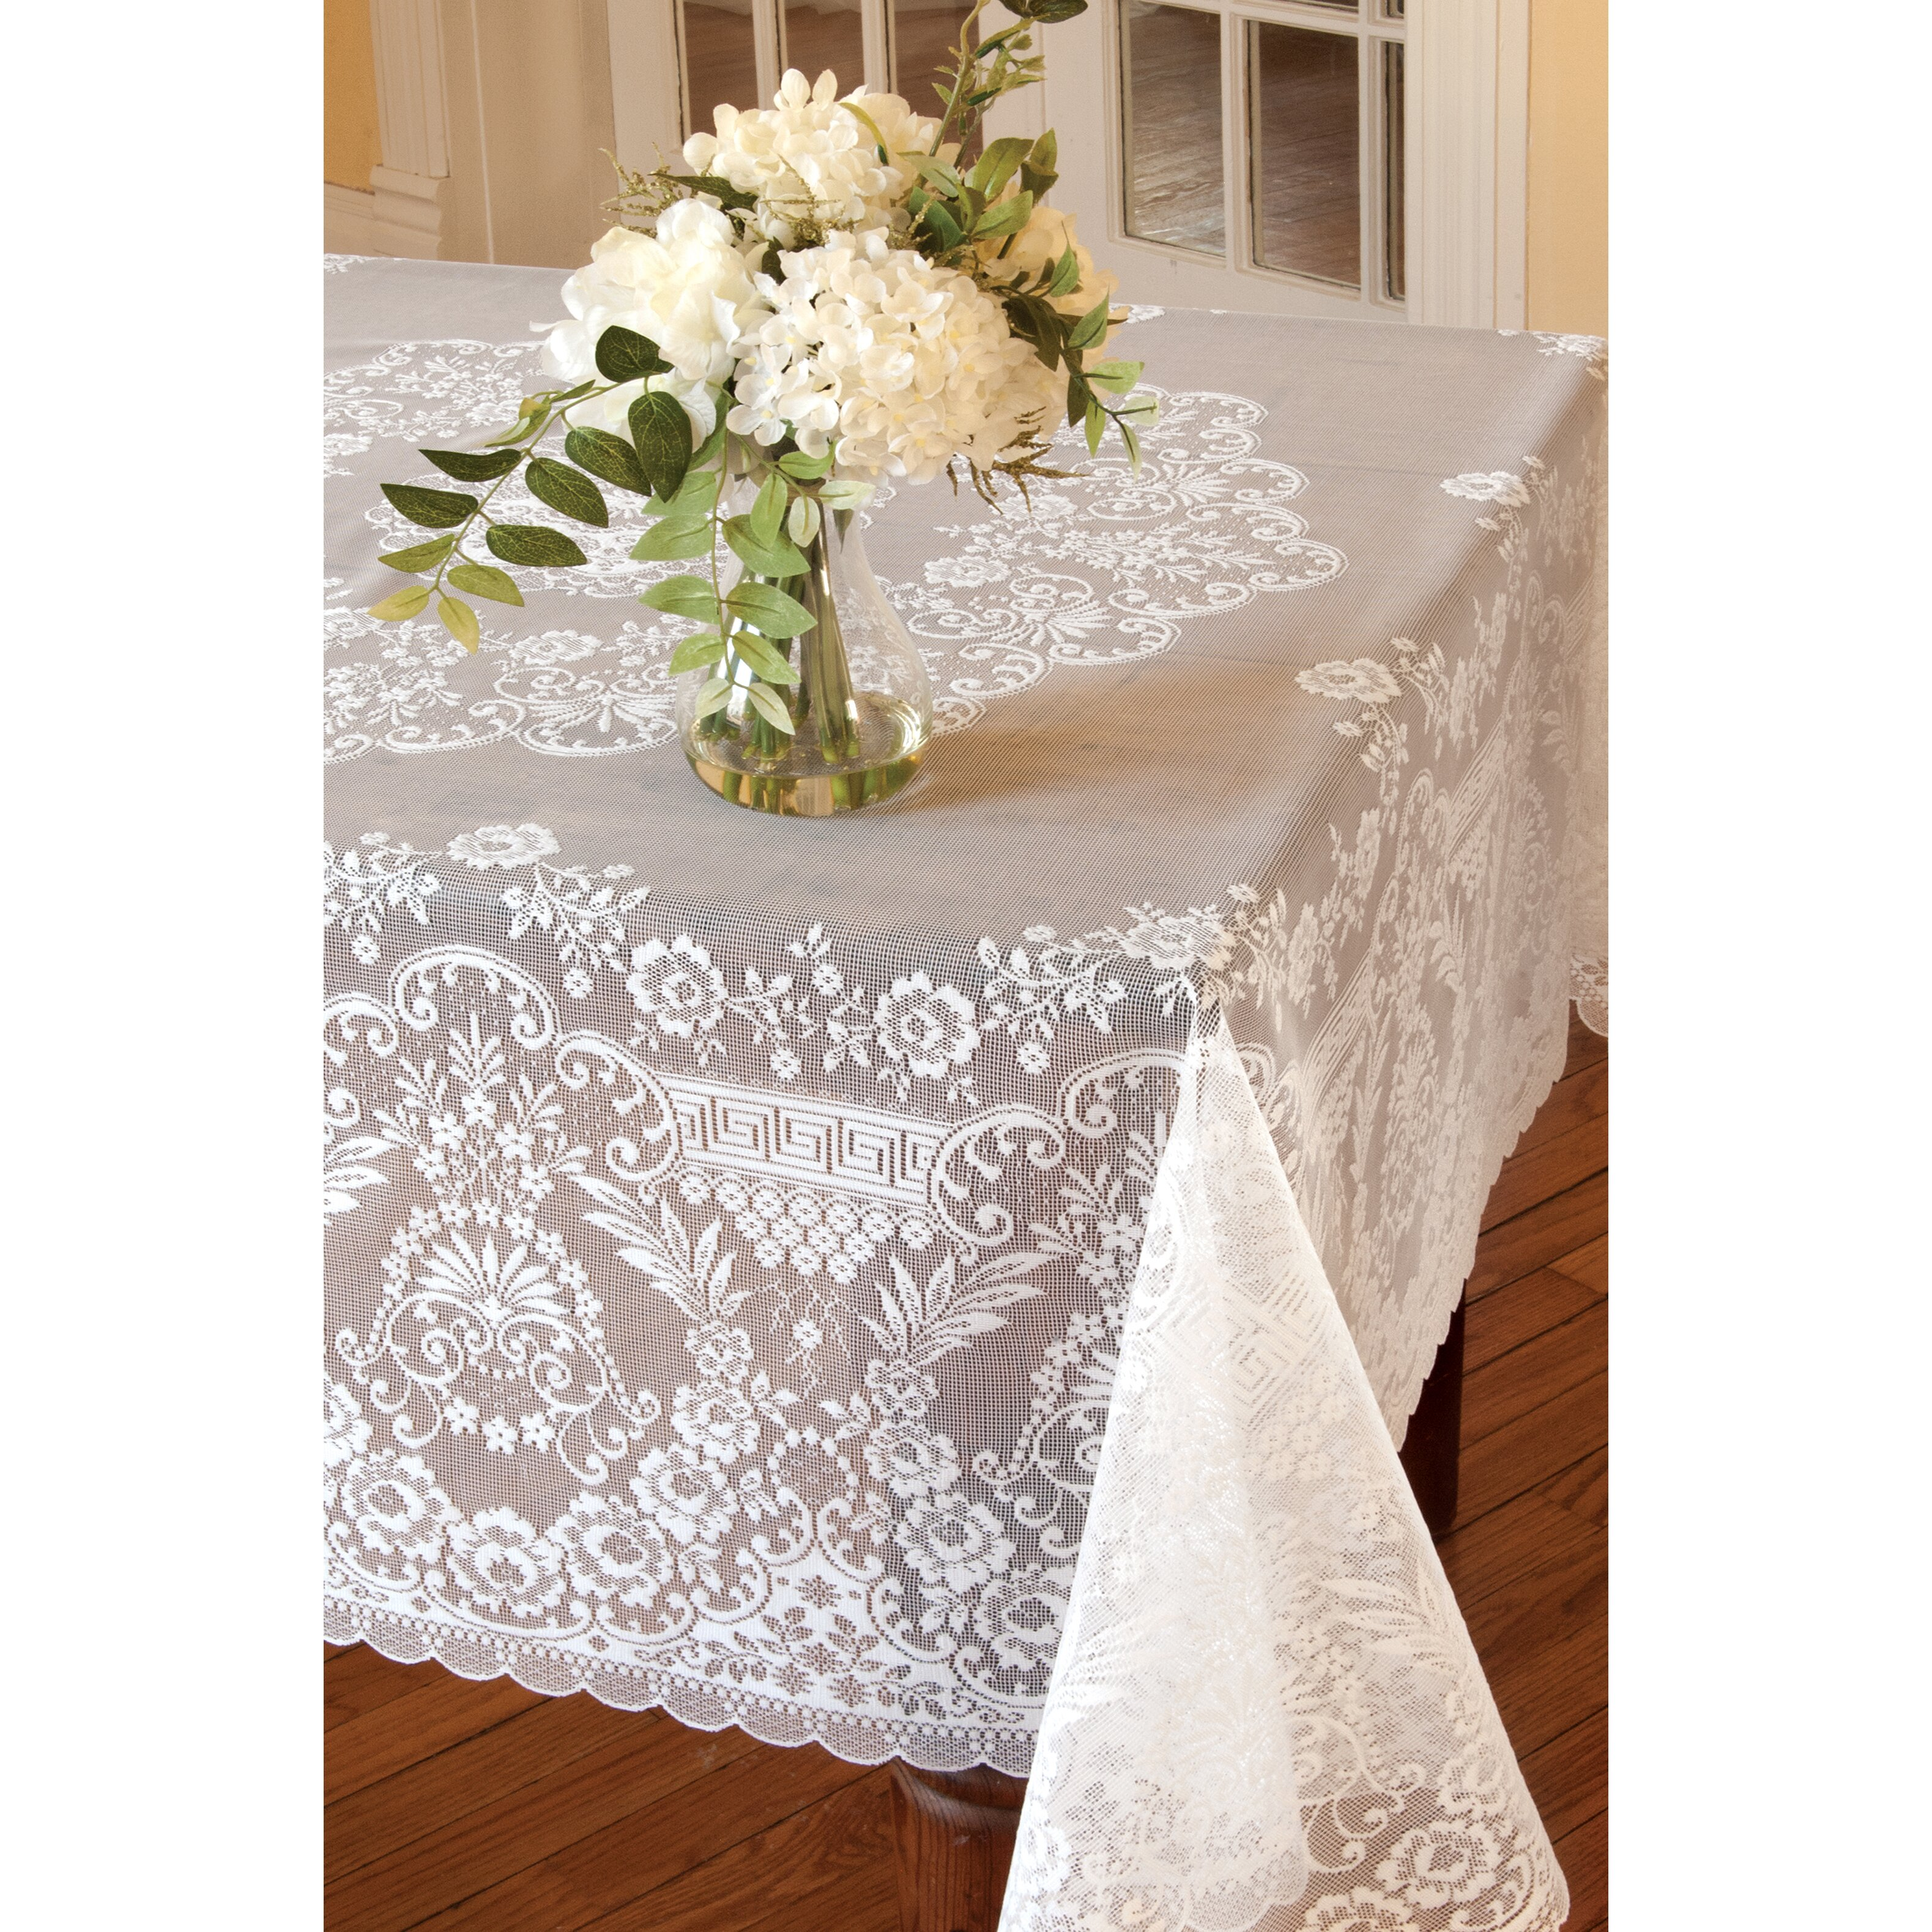 Downton Abbey Kitchen Table